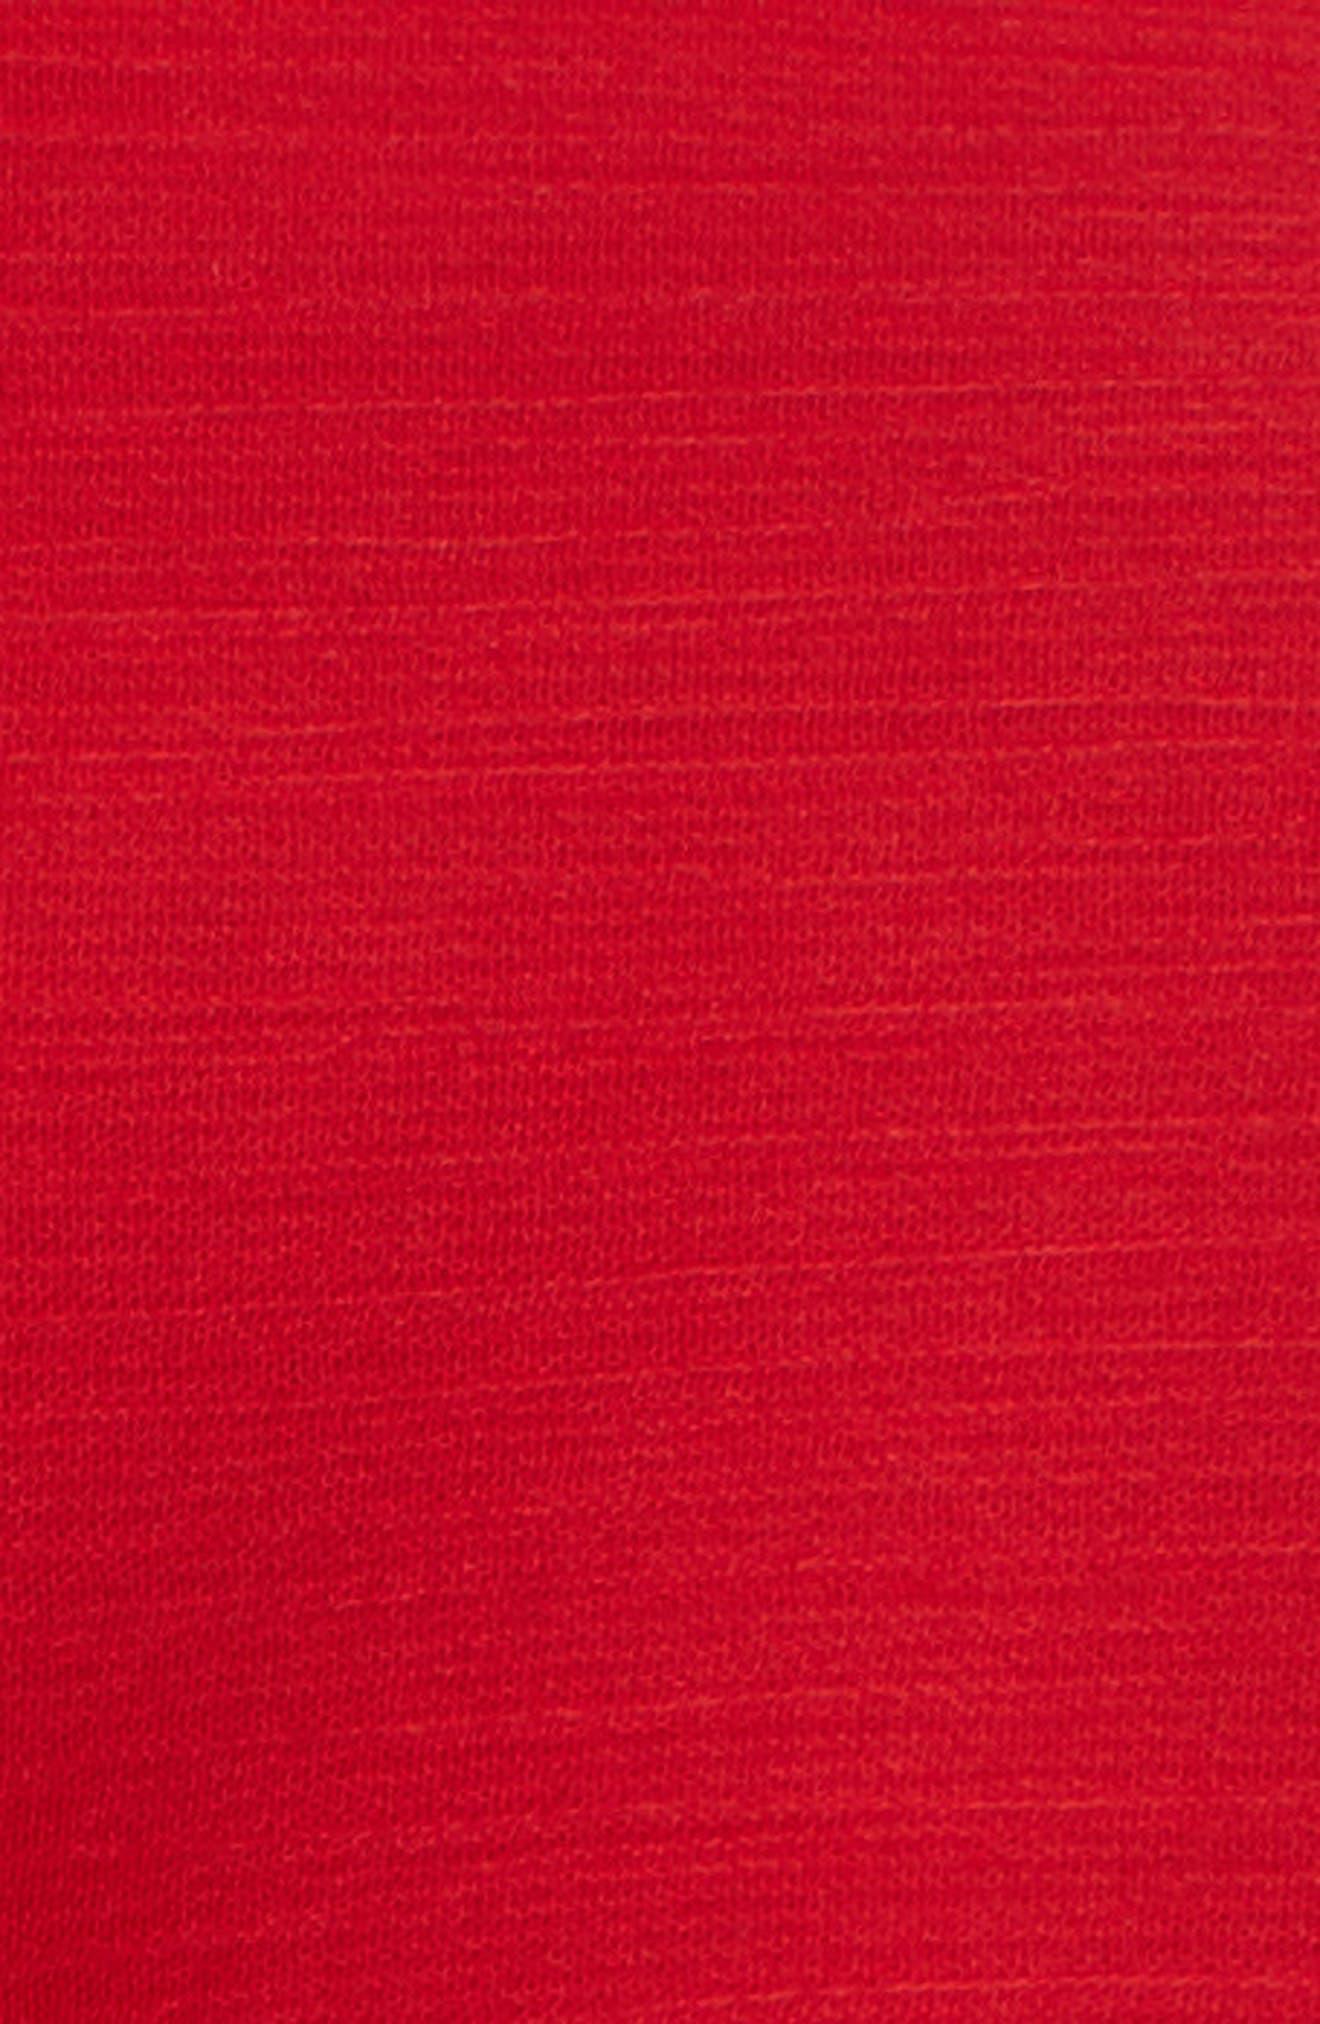 Sheer Drawstring Shirtdress,                             Alternate thumbnail 6, color,                             Red